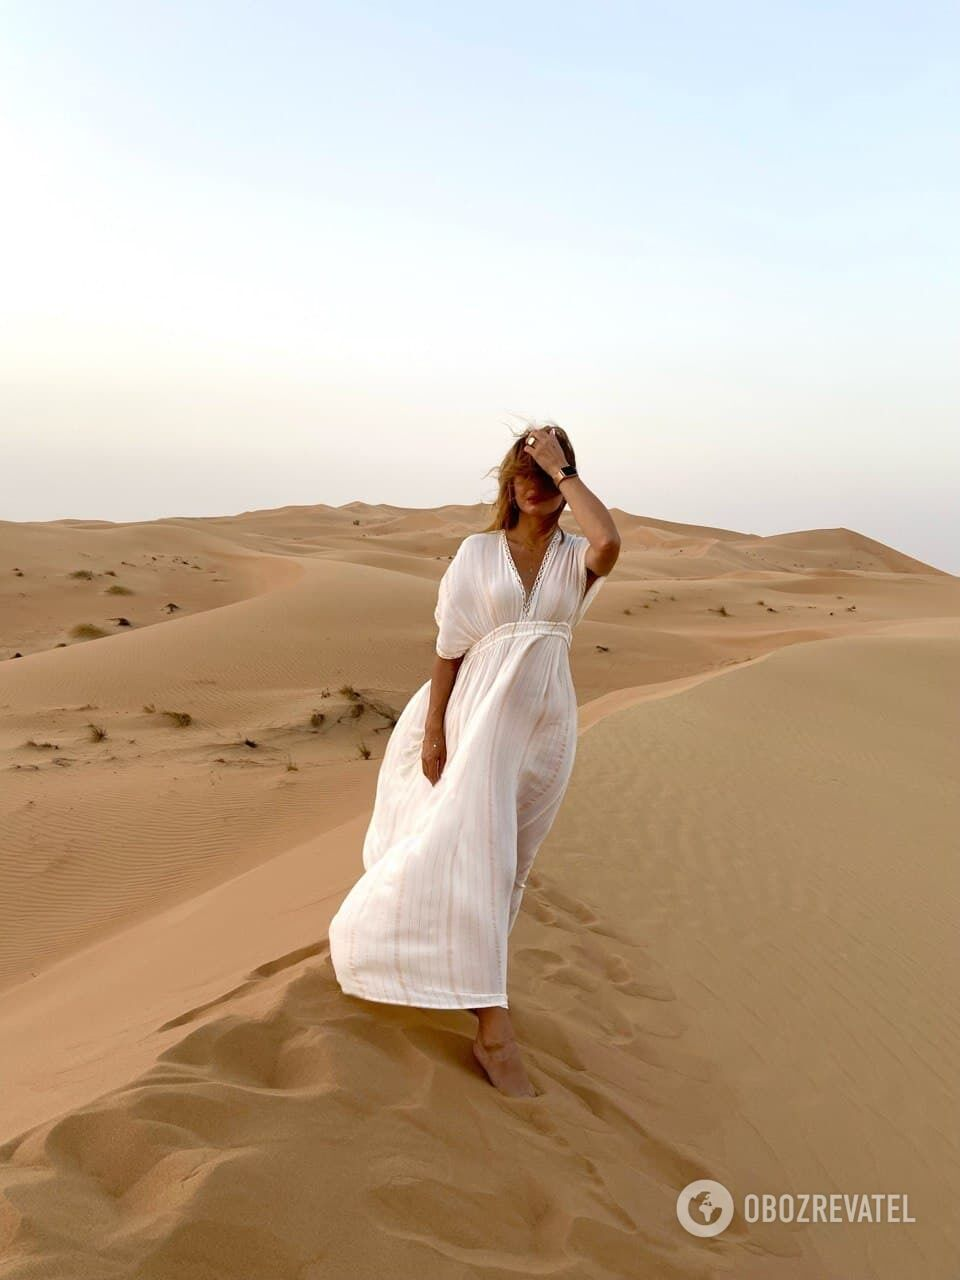 Кадр с закатного джип-сафари в пустыне Dubai Desert Conservation Reserve.